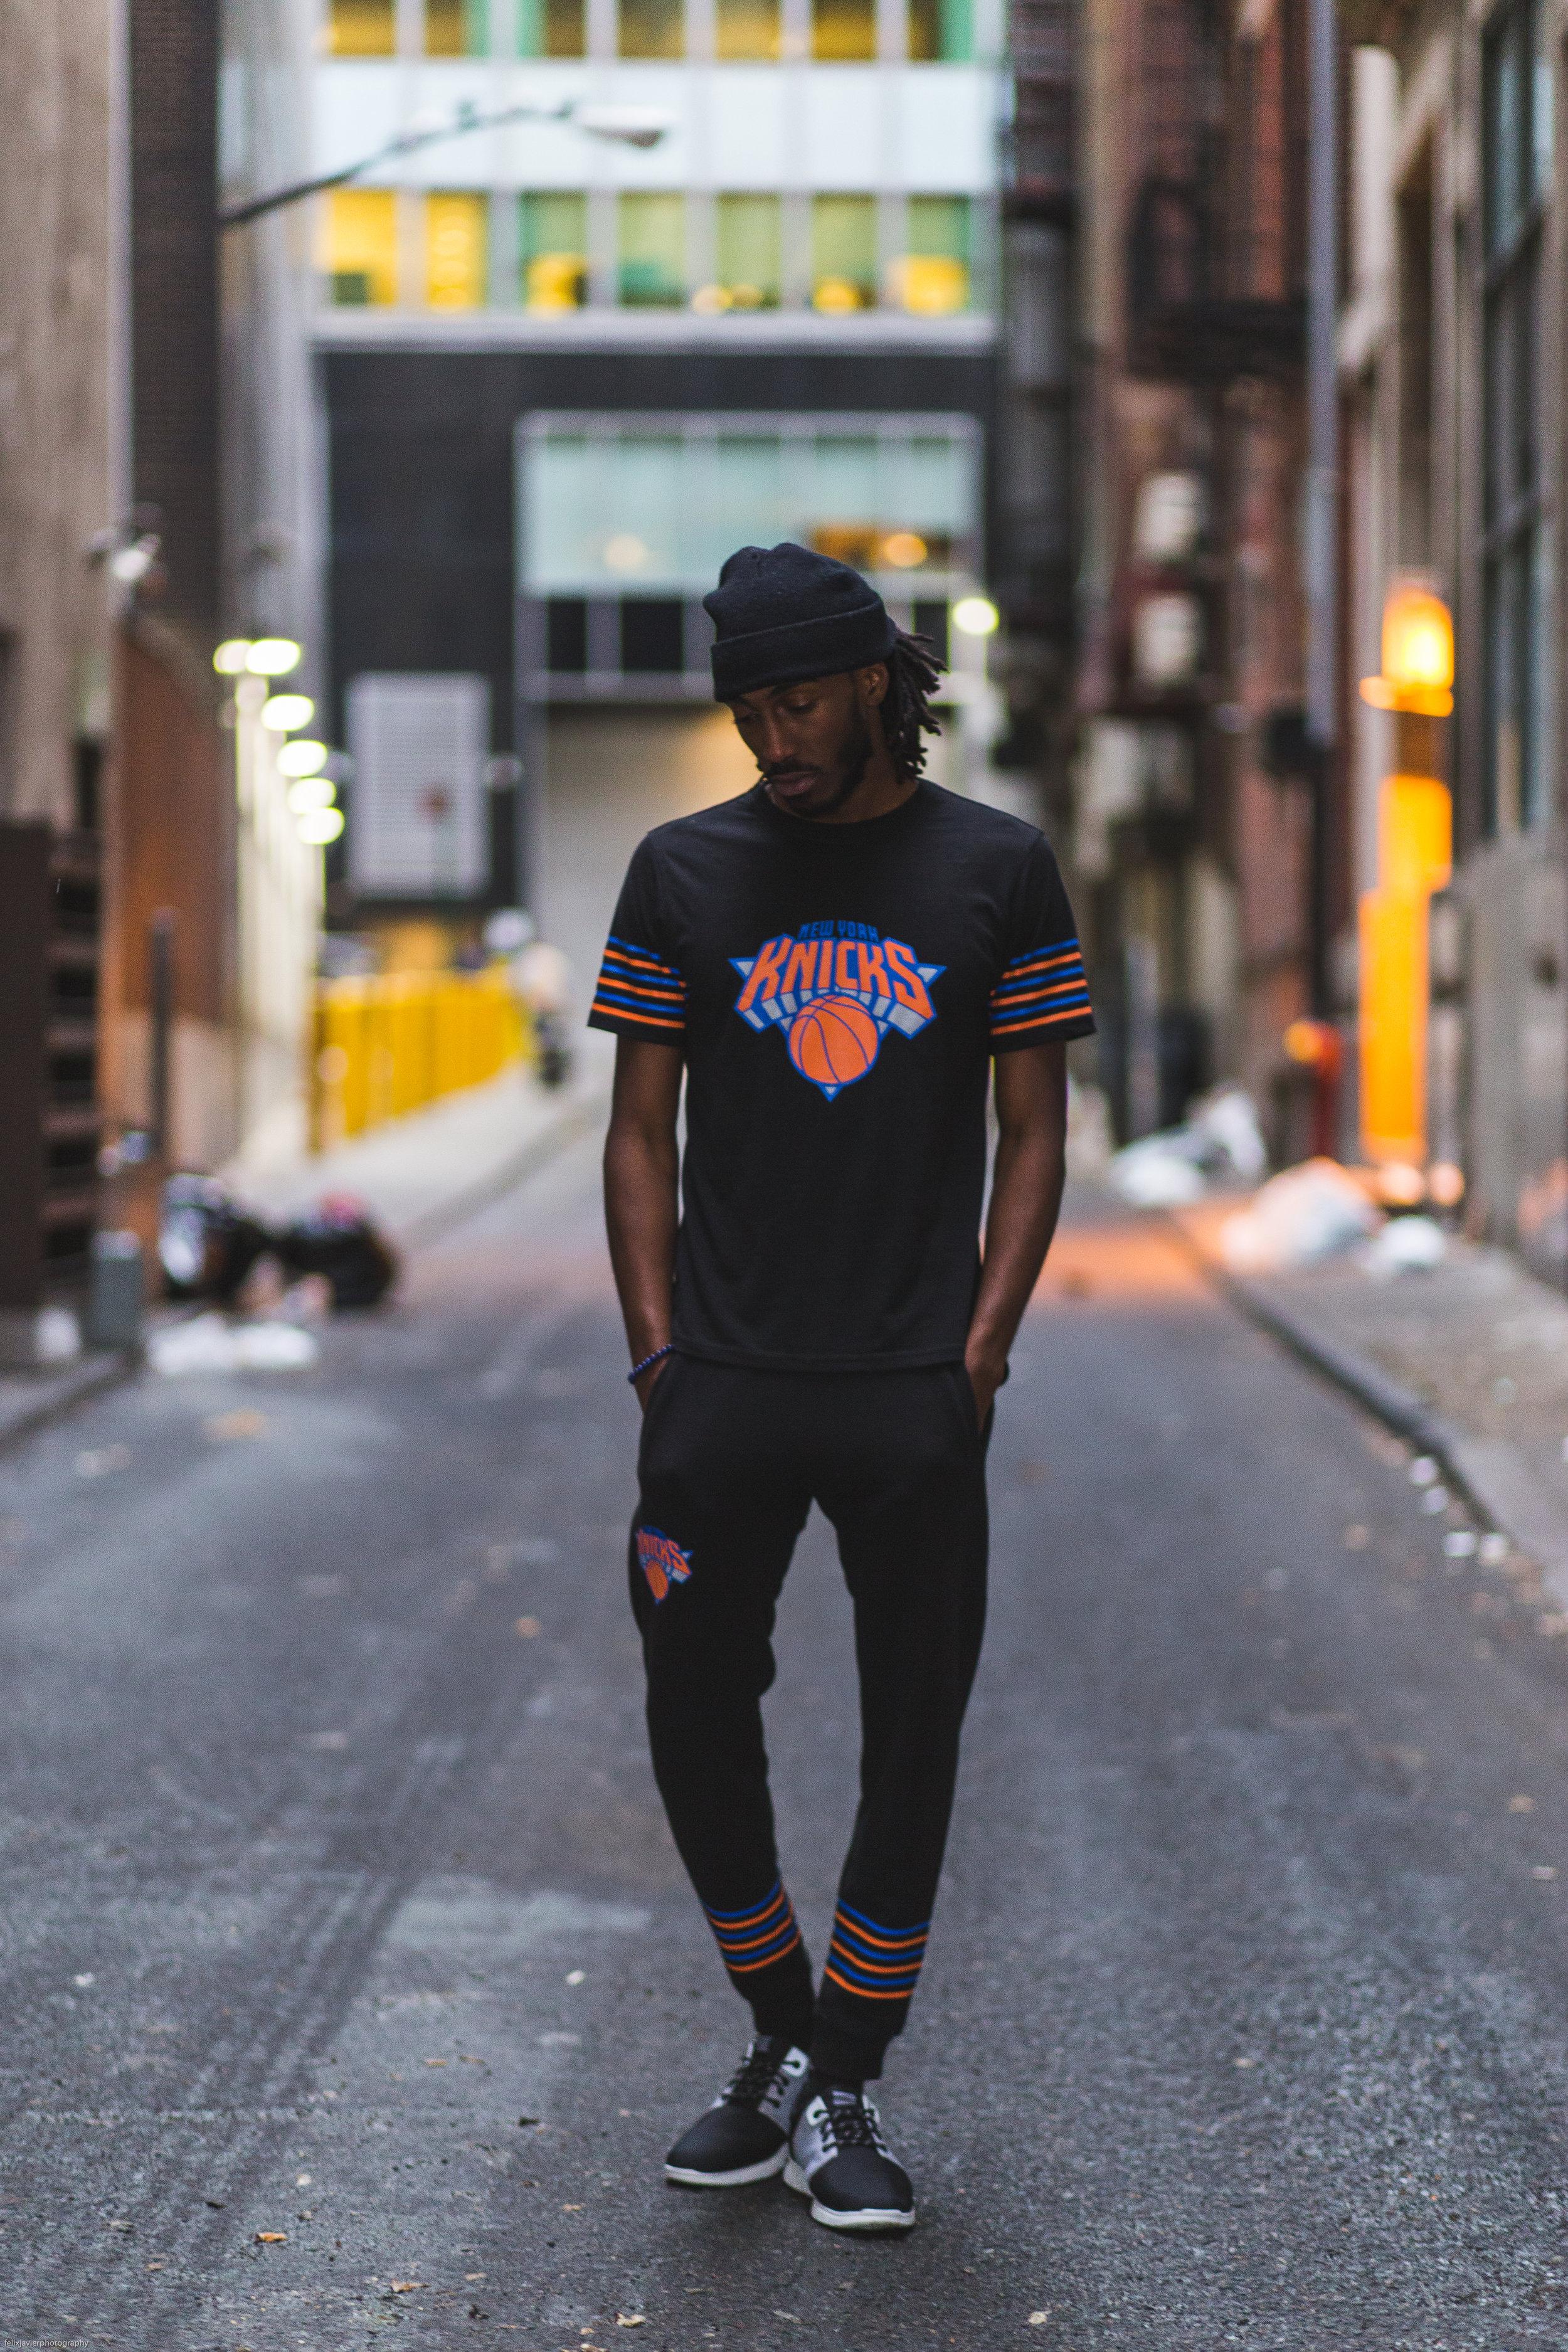 Grungy Gentleman x New York Knicks 1.jpg